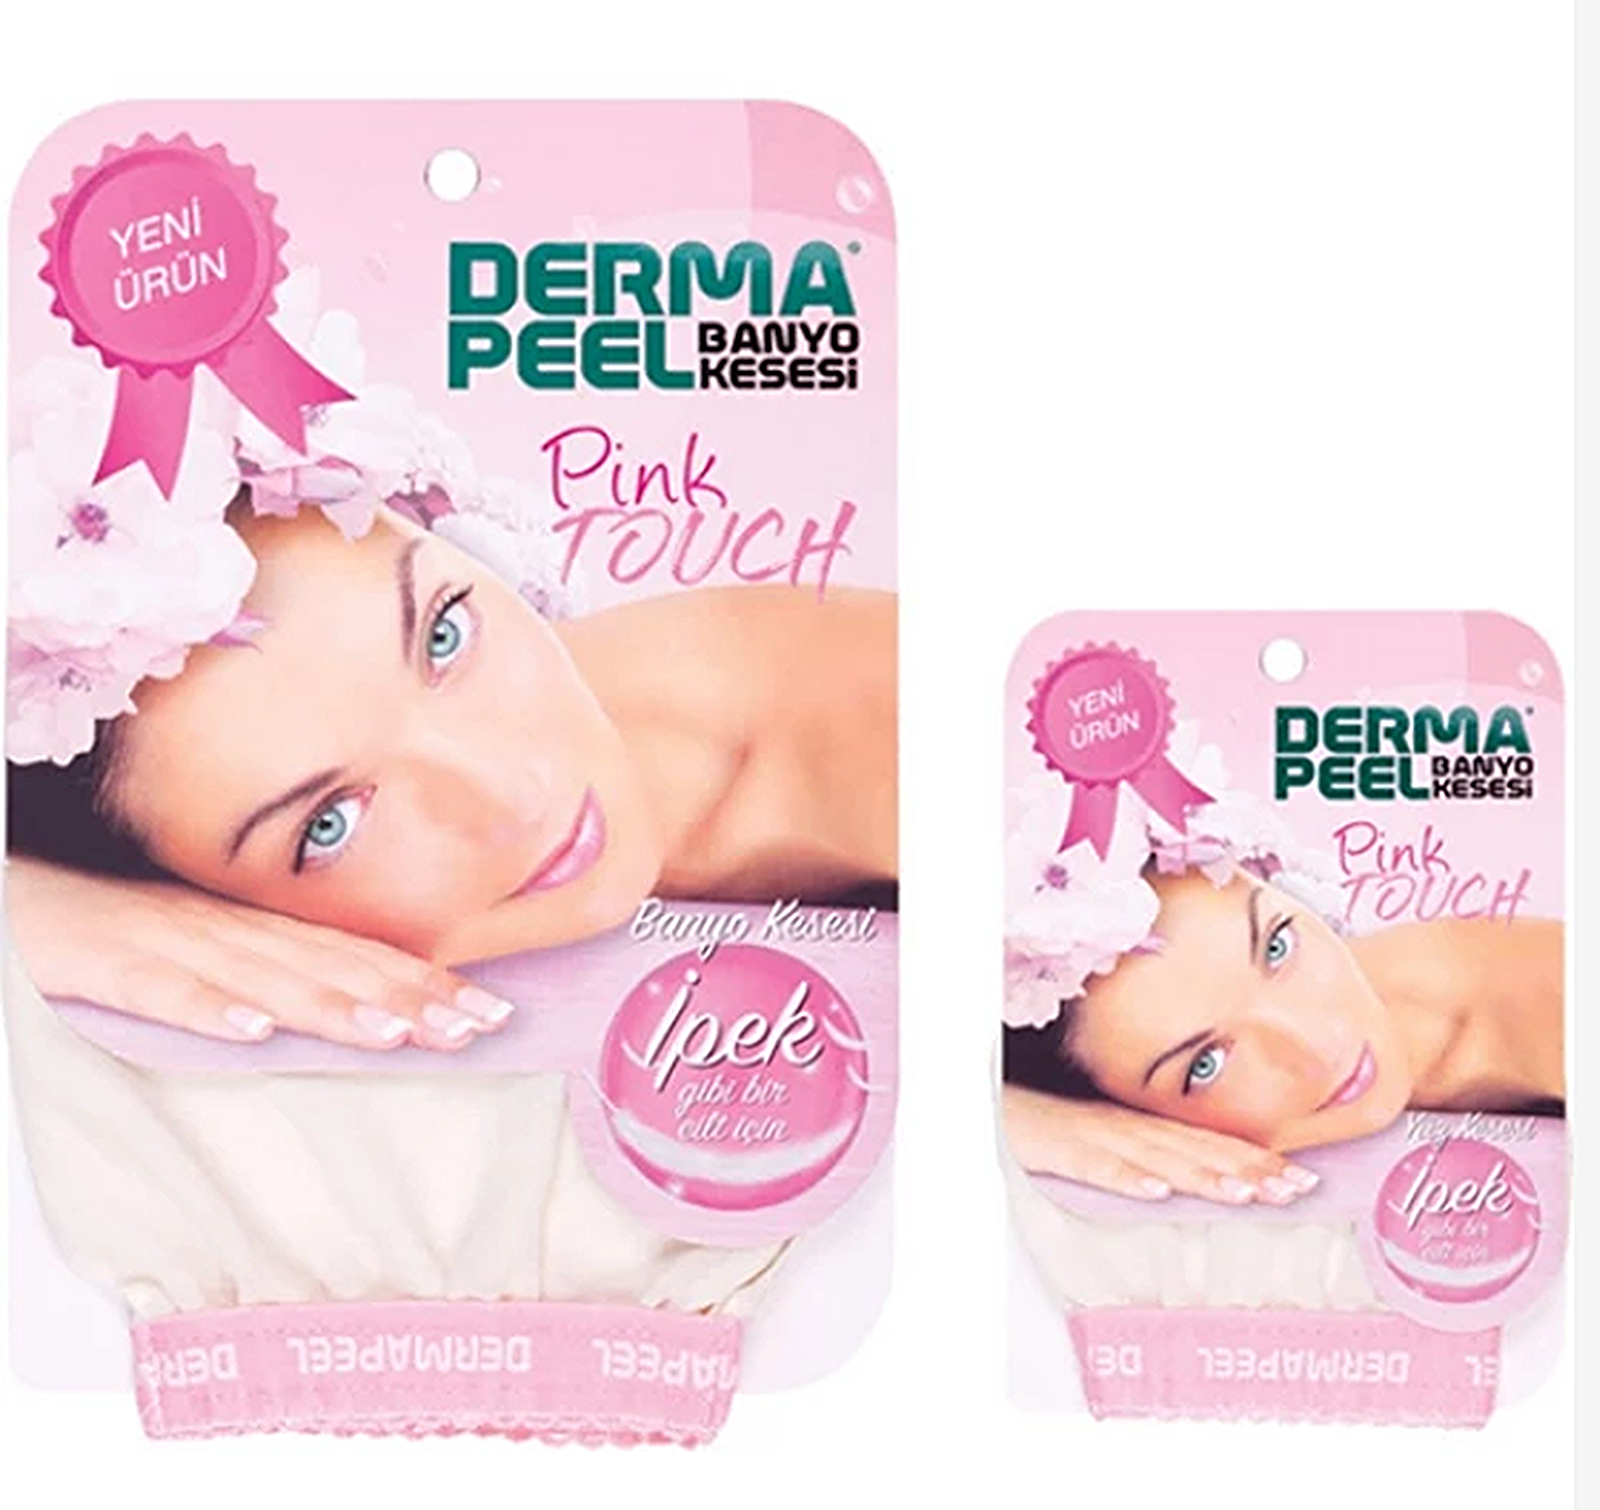 Face and body scrub set 2pcs skin face exfoliating bath fiber acne cellulite turkish baths ottoman pouch foam soap